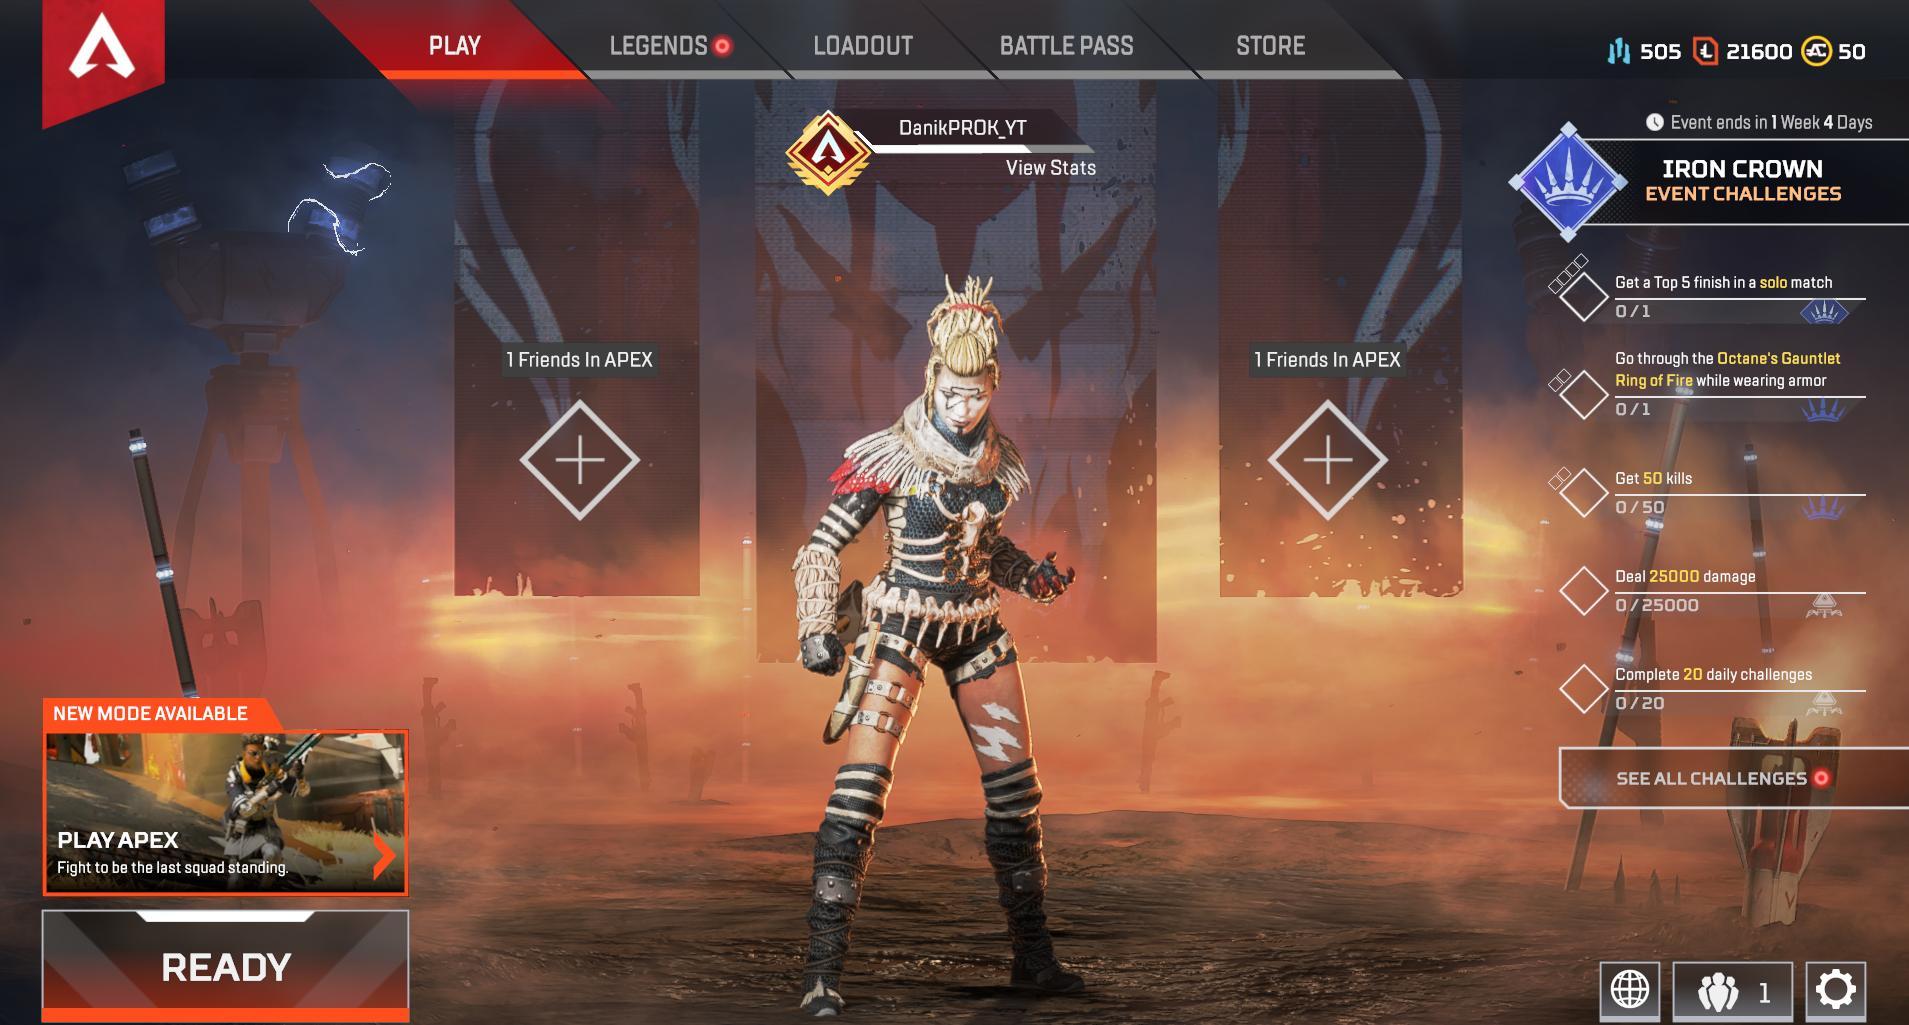 APEX Legends ACCOUNT-Level 119✅Full Legends & 21600 Tokens